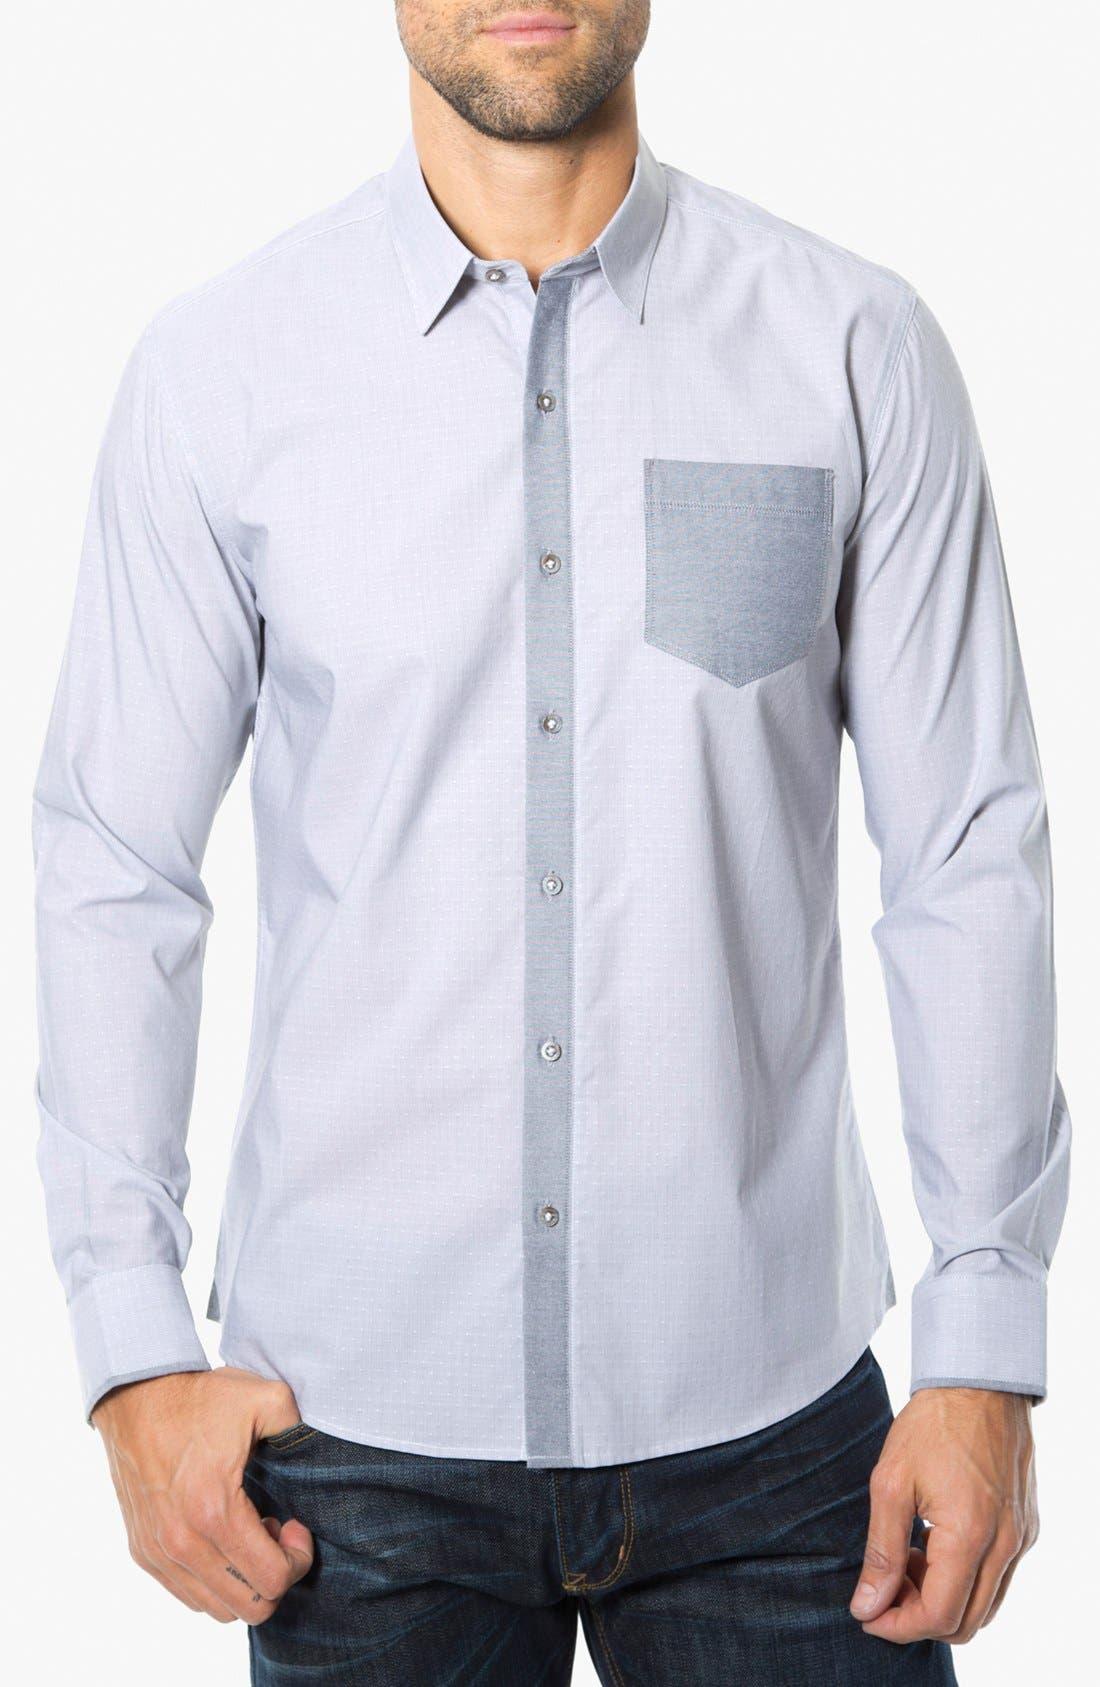 Alternate Image 1 Selected - 7 Diamonds 'Electric Company' Trim Fit Cotton Sport Shirt